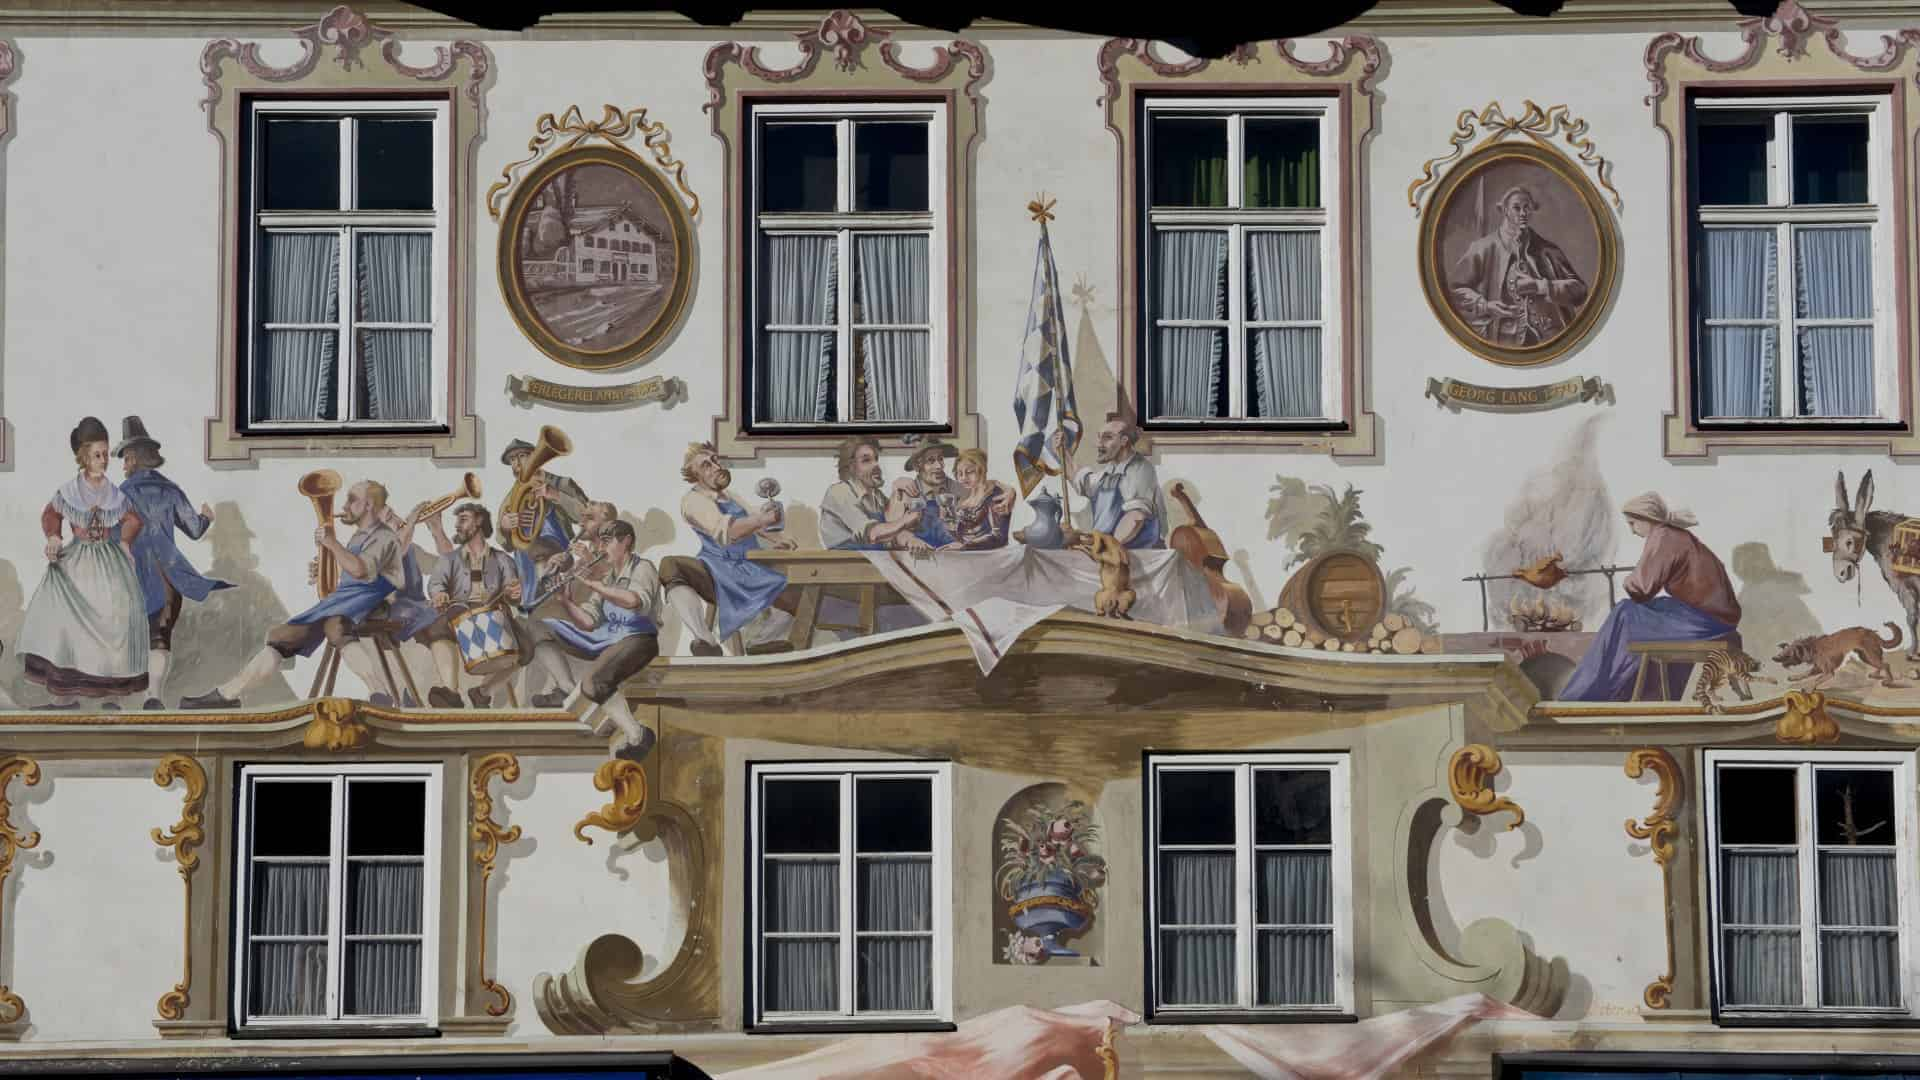 Oberammergau in the Bavarian Alps